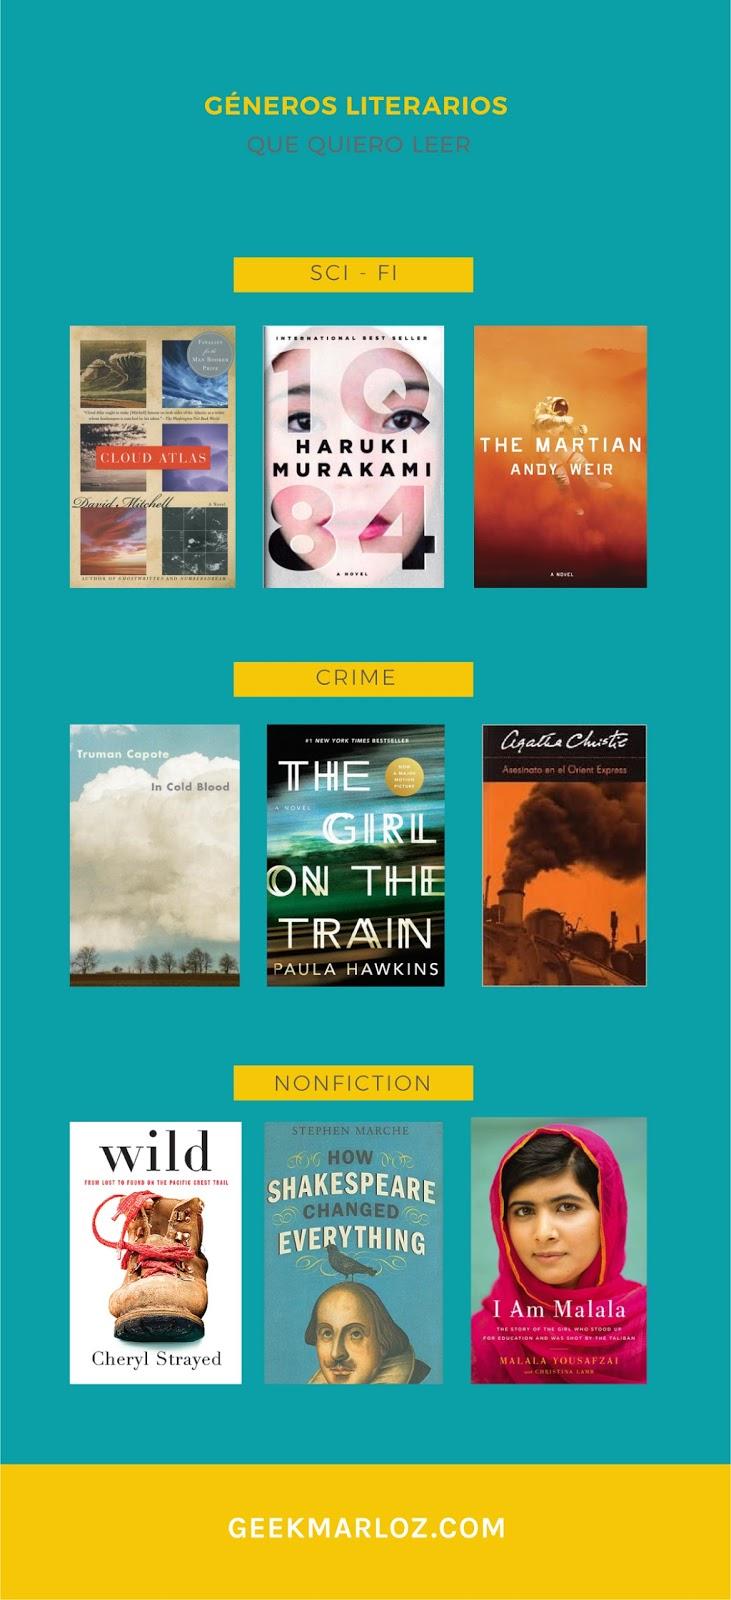 GeekMarloz| 3 géneros literarios que me gustaría leer